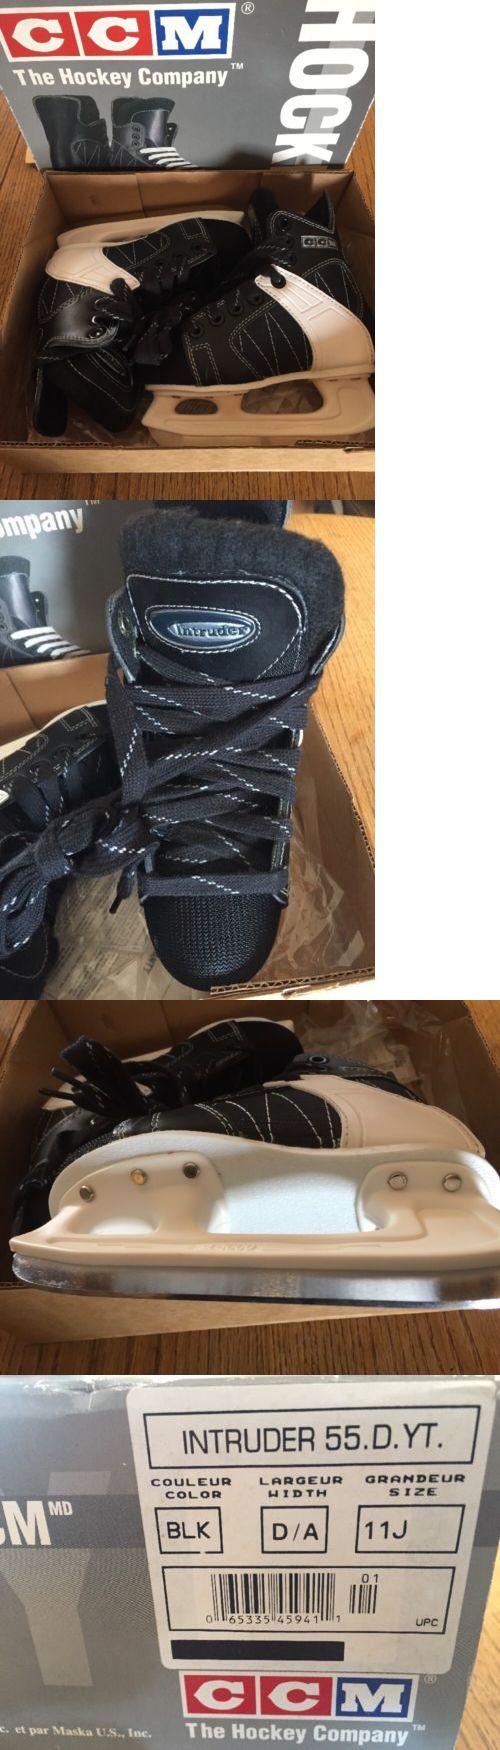 Ice Hockey-Youth 26342: Ccm Ice Hockey Skates Intruder 55 Youth Junior Size 11 J New -> BUY IT NOW ONLY: $42.59 on eBay!